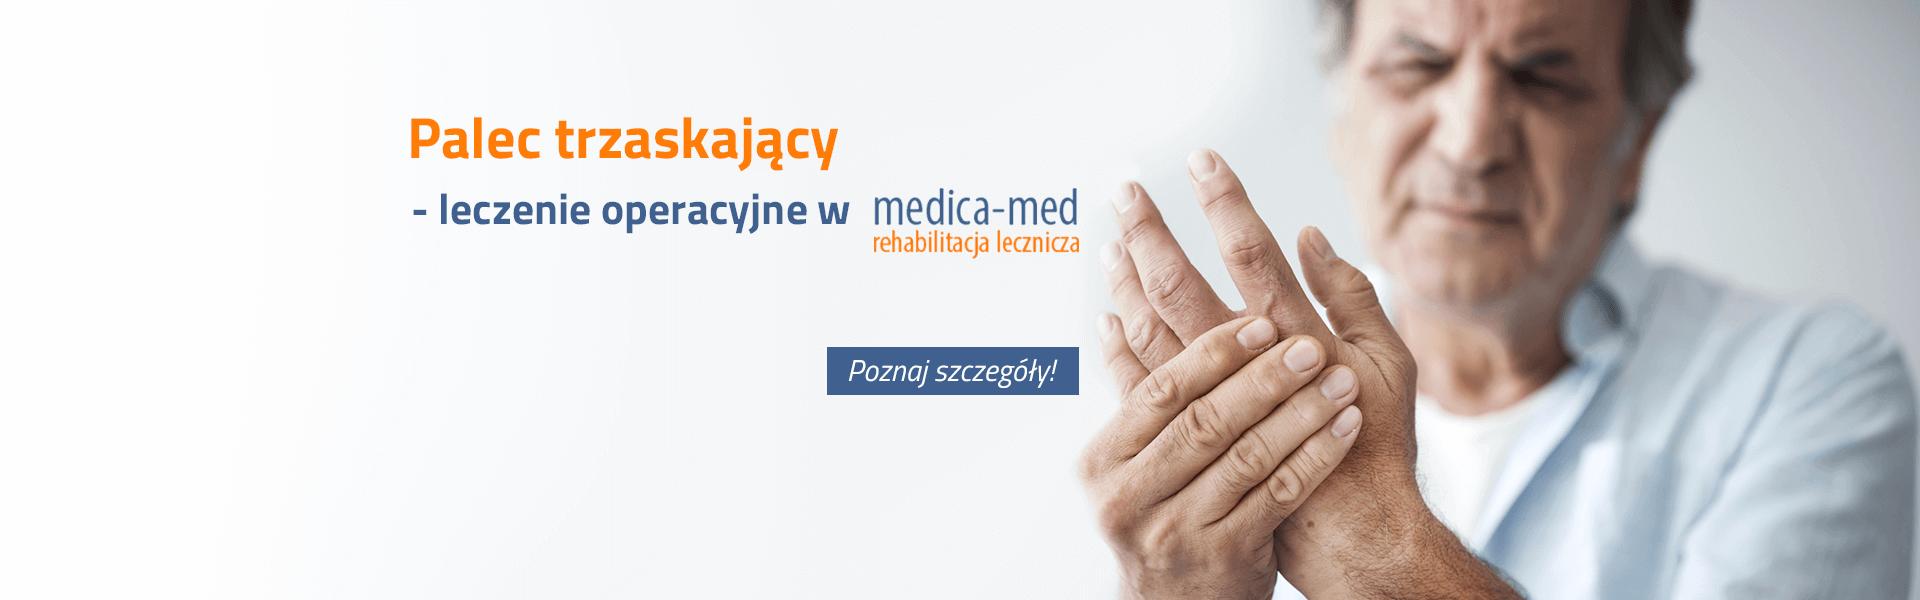 Medicamed Palec trzaskający slider